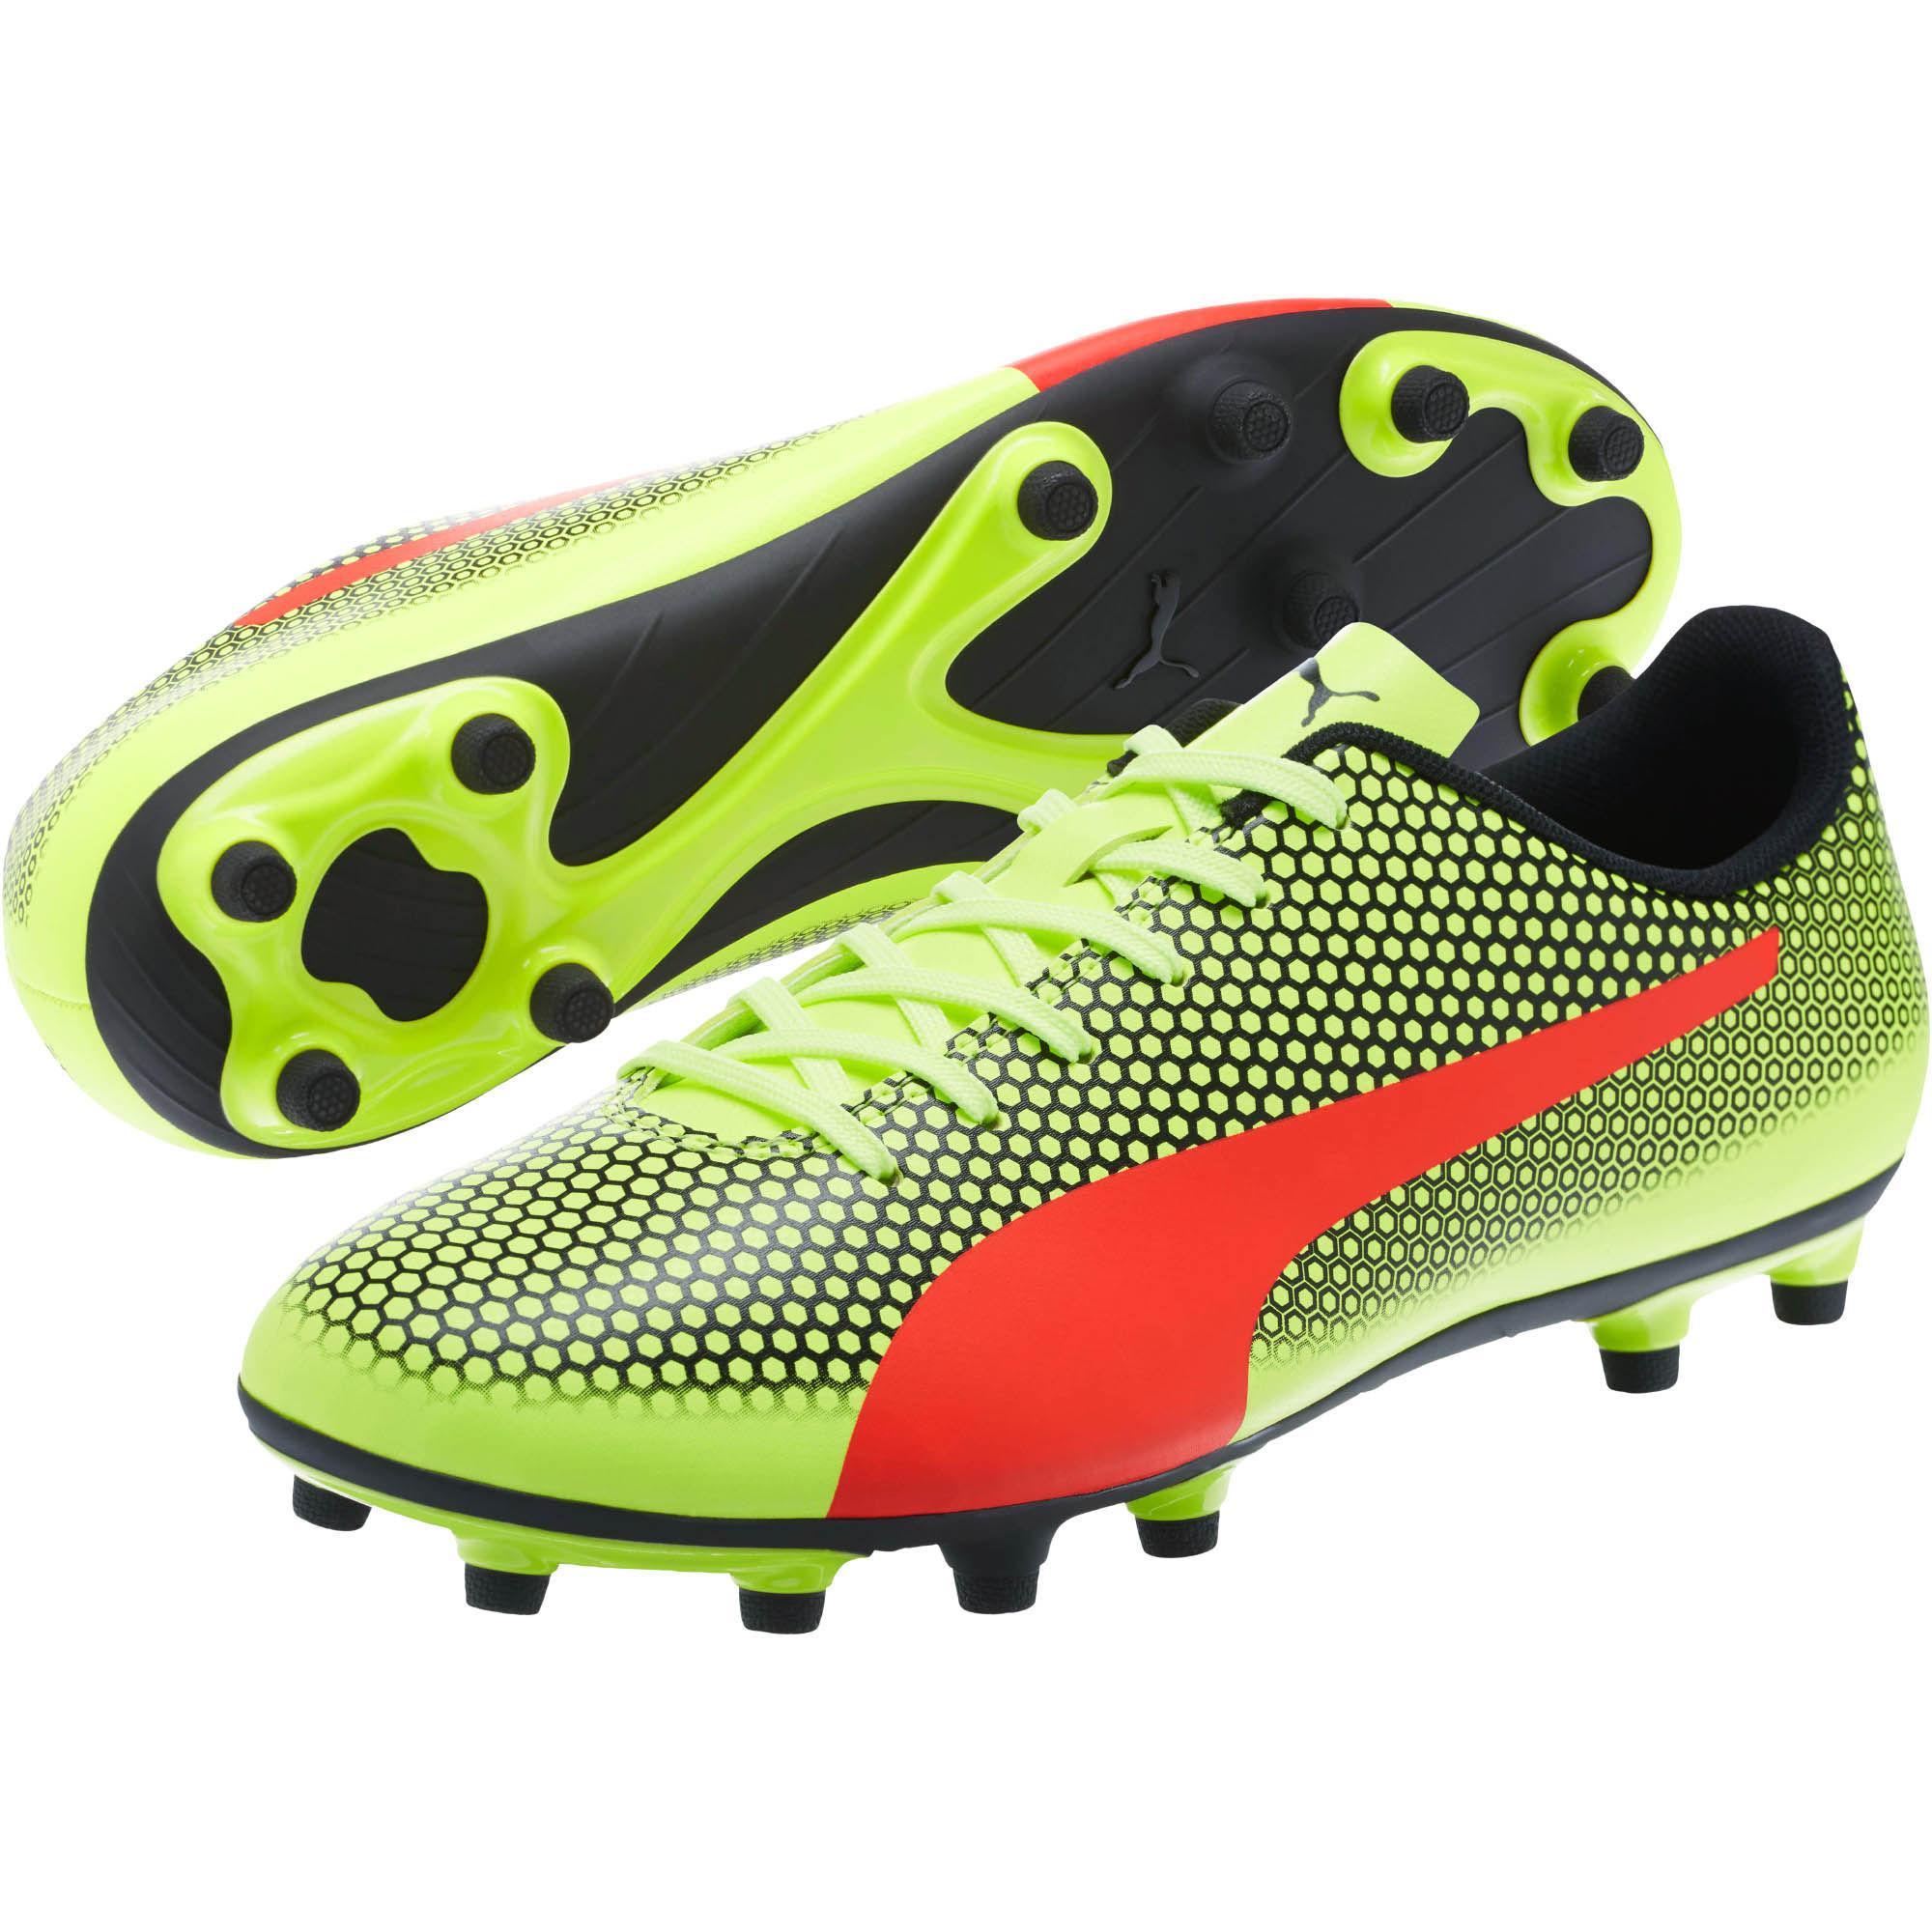 Lyst - PUMA Spirit Fg Firm Ground Men s Soccer Cleats in Green for Men 53865706f